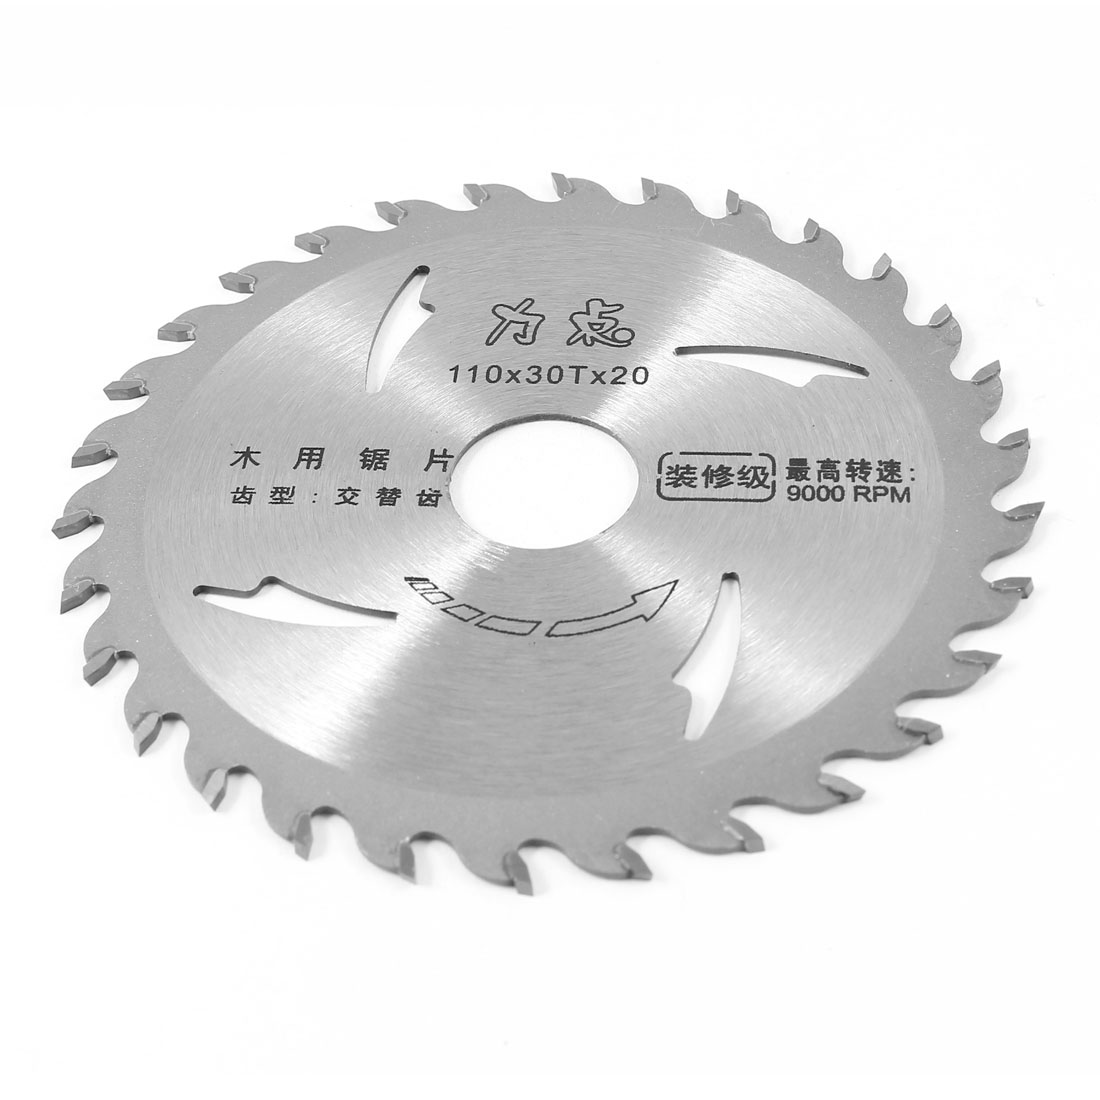 "Silver Tone Wood Cutting Cutter Cutters Saw 4"" Dia 30 Teeth Max 9000 RPM"